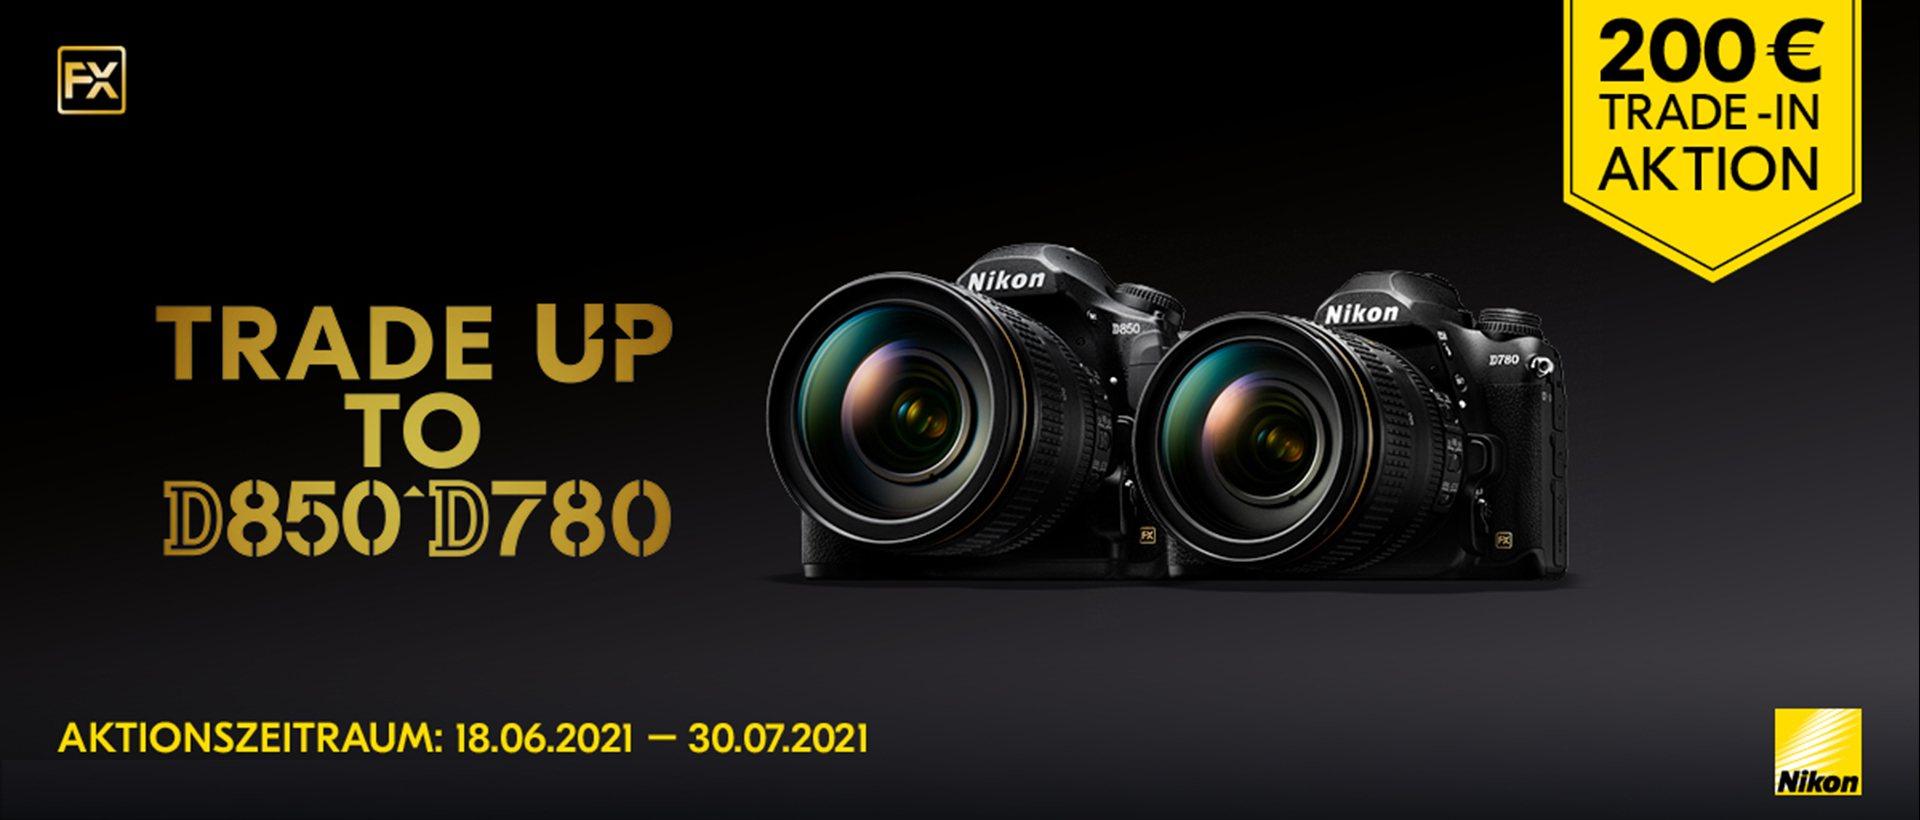 Nikon D850 / D780 Trade-In